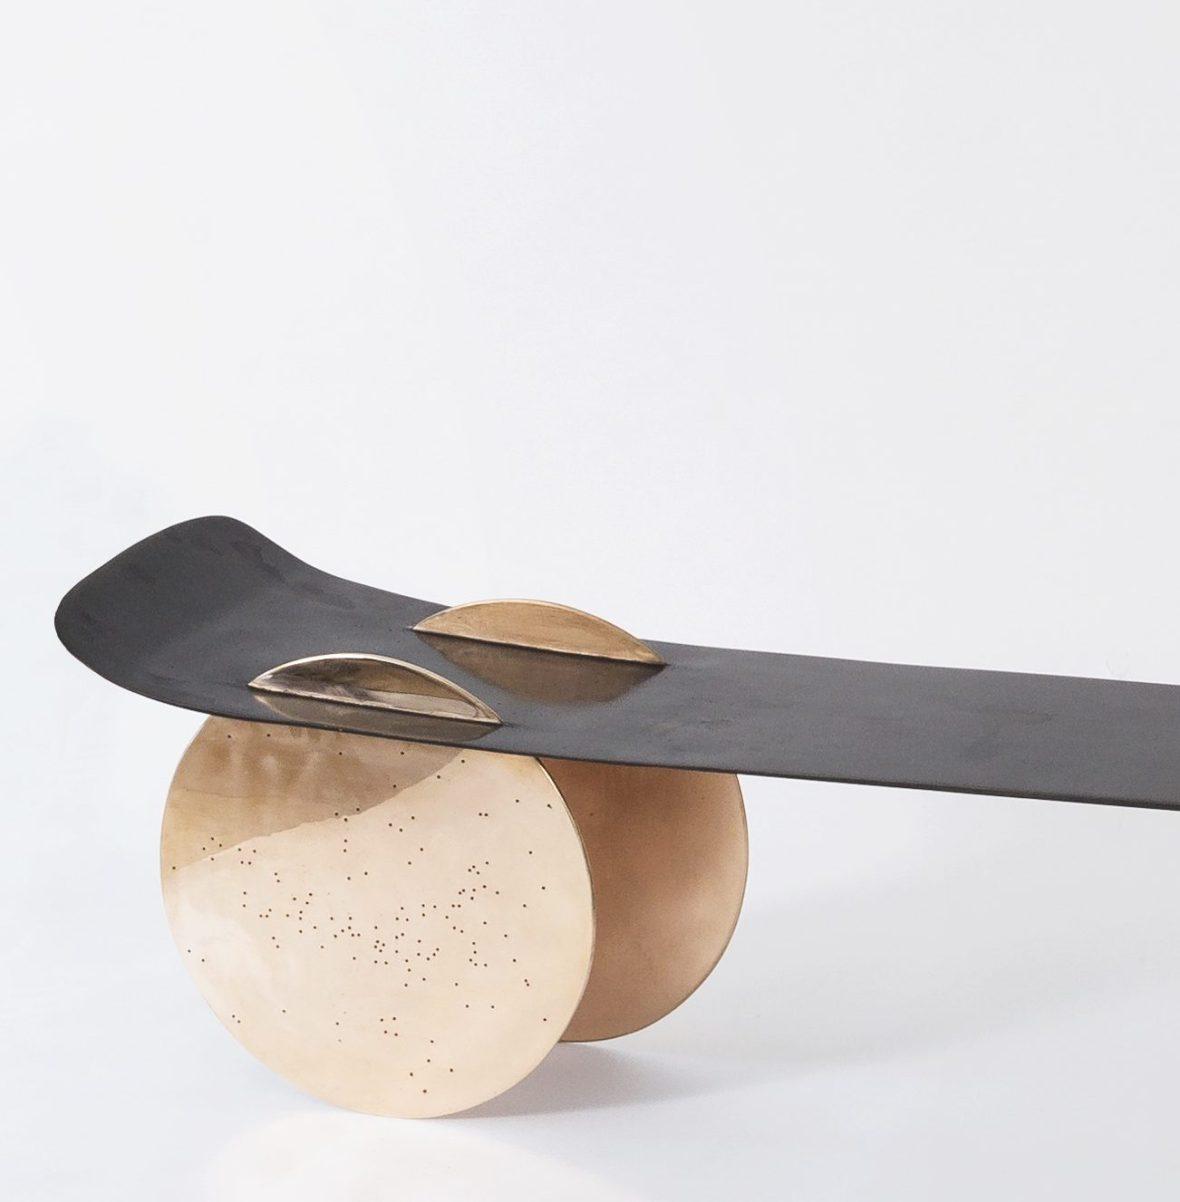 patrick-naggar-banc-hemisphere-disques